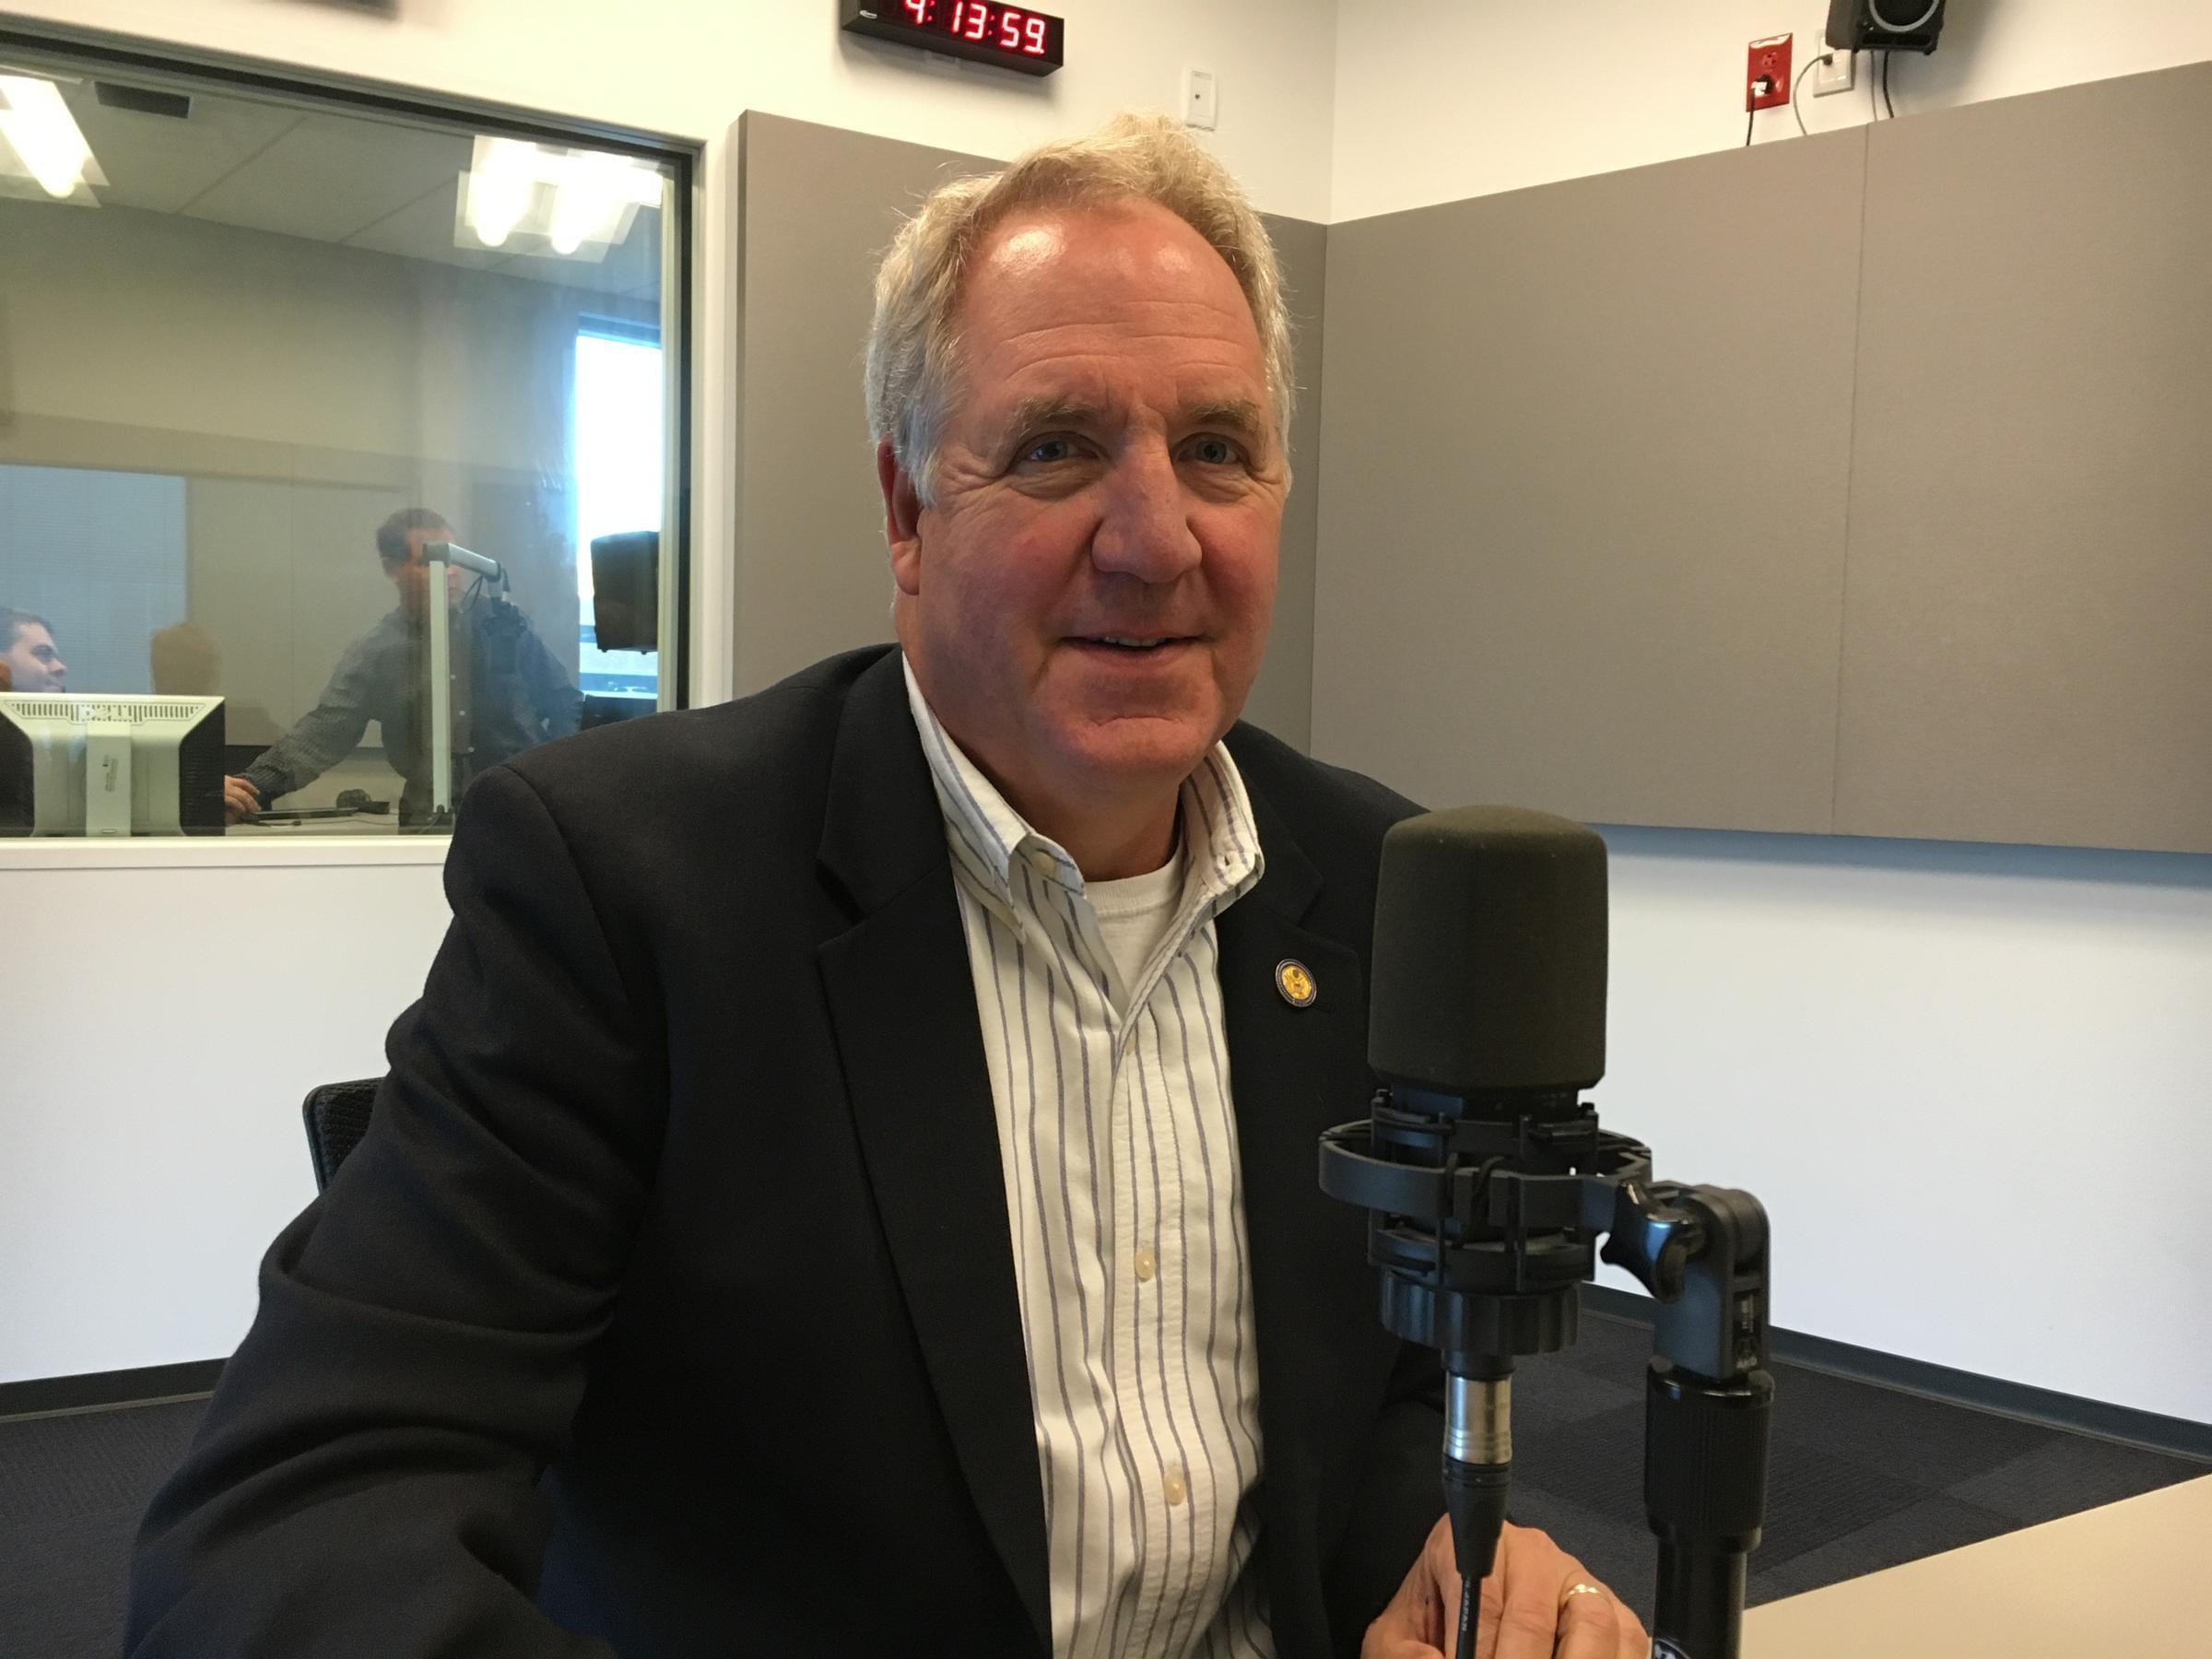 John Shimkus at the studios of St. Louis Public Radio.